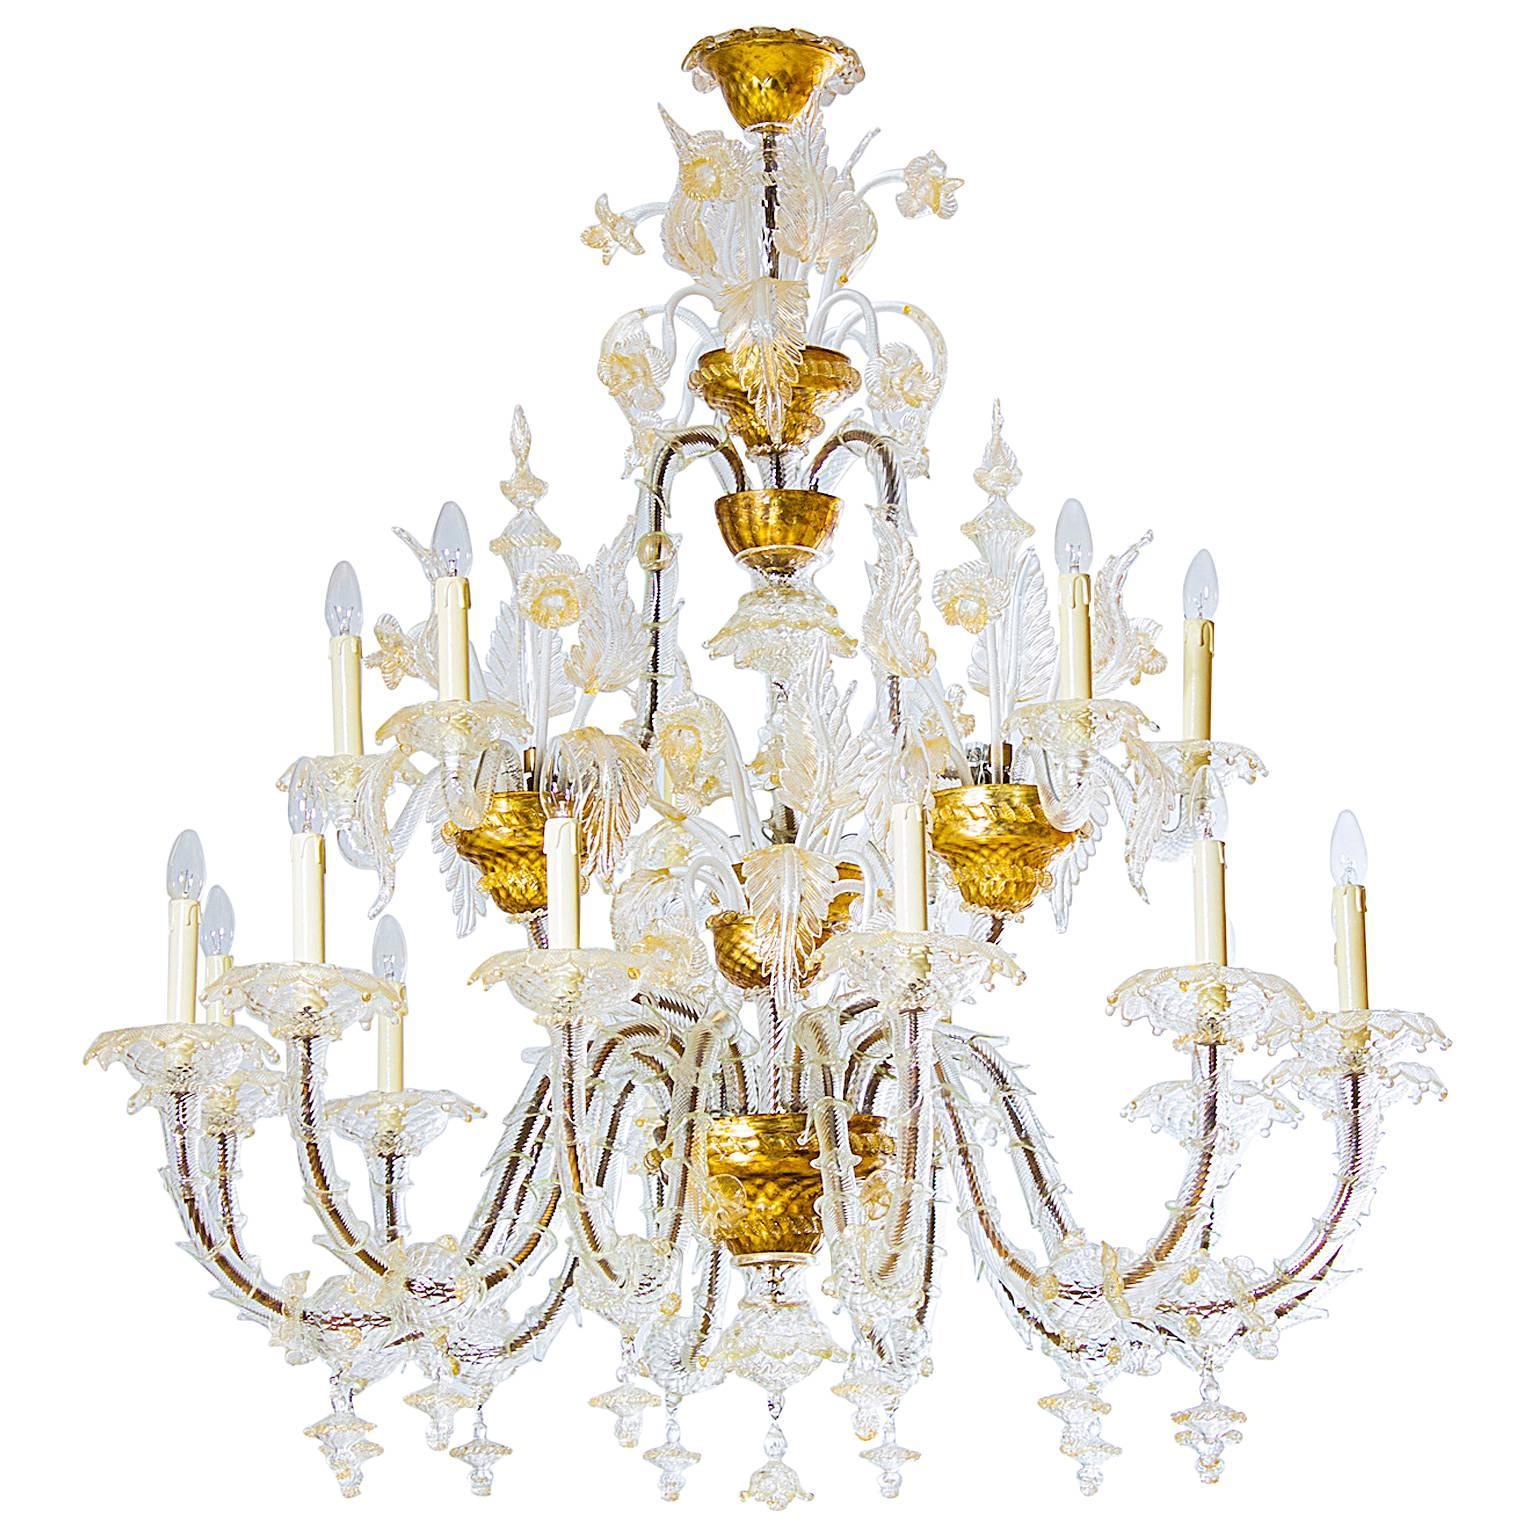 Italian Ca' Rezzonico Chandelier in Blown Murano Glass Gold 1950s